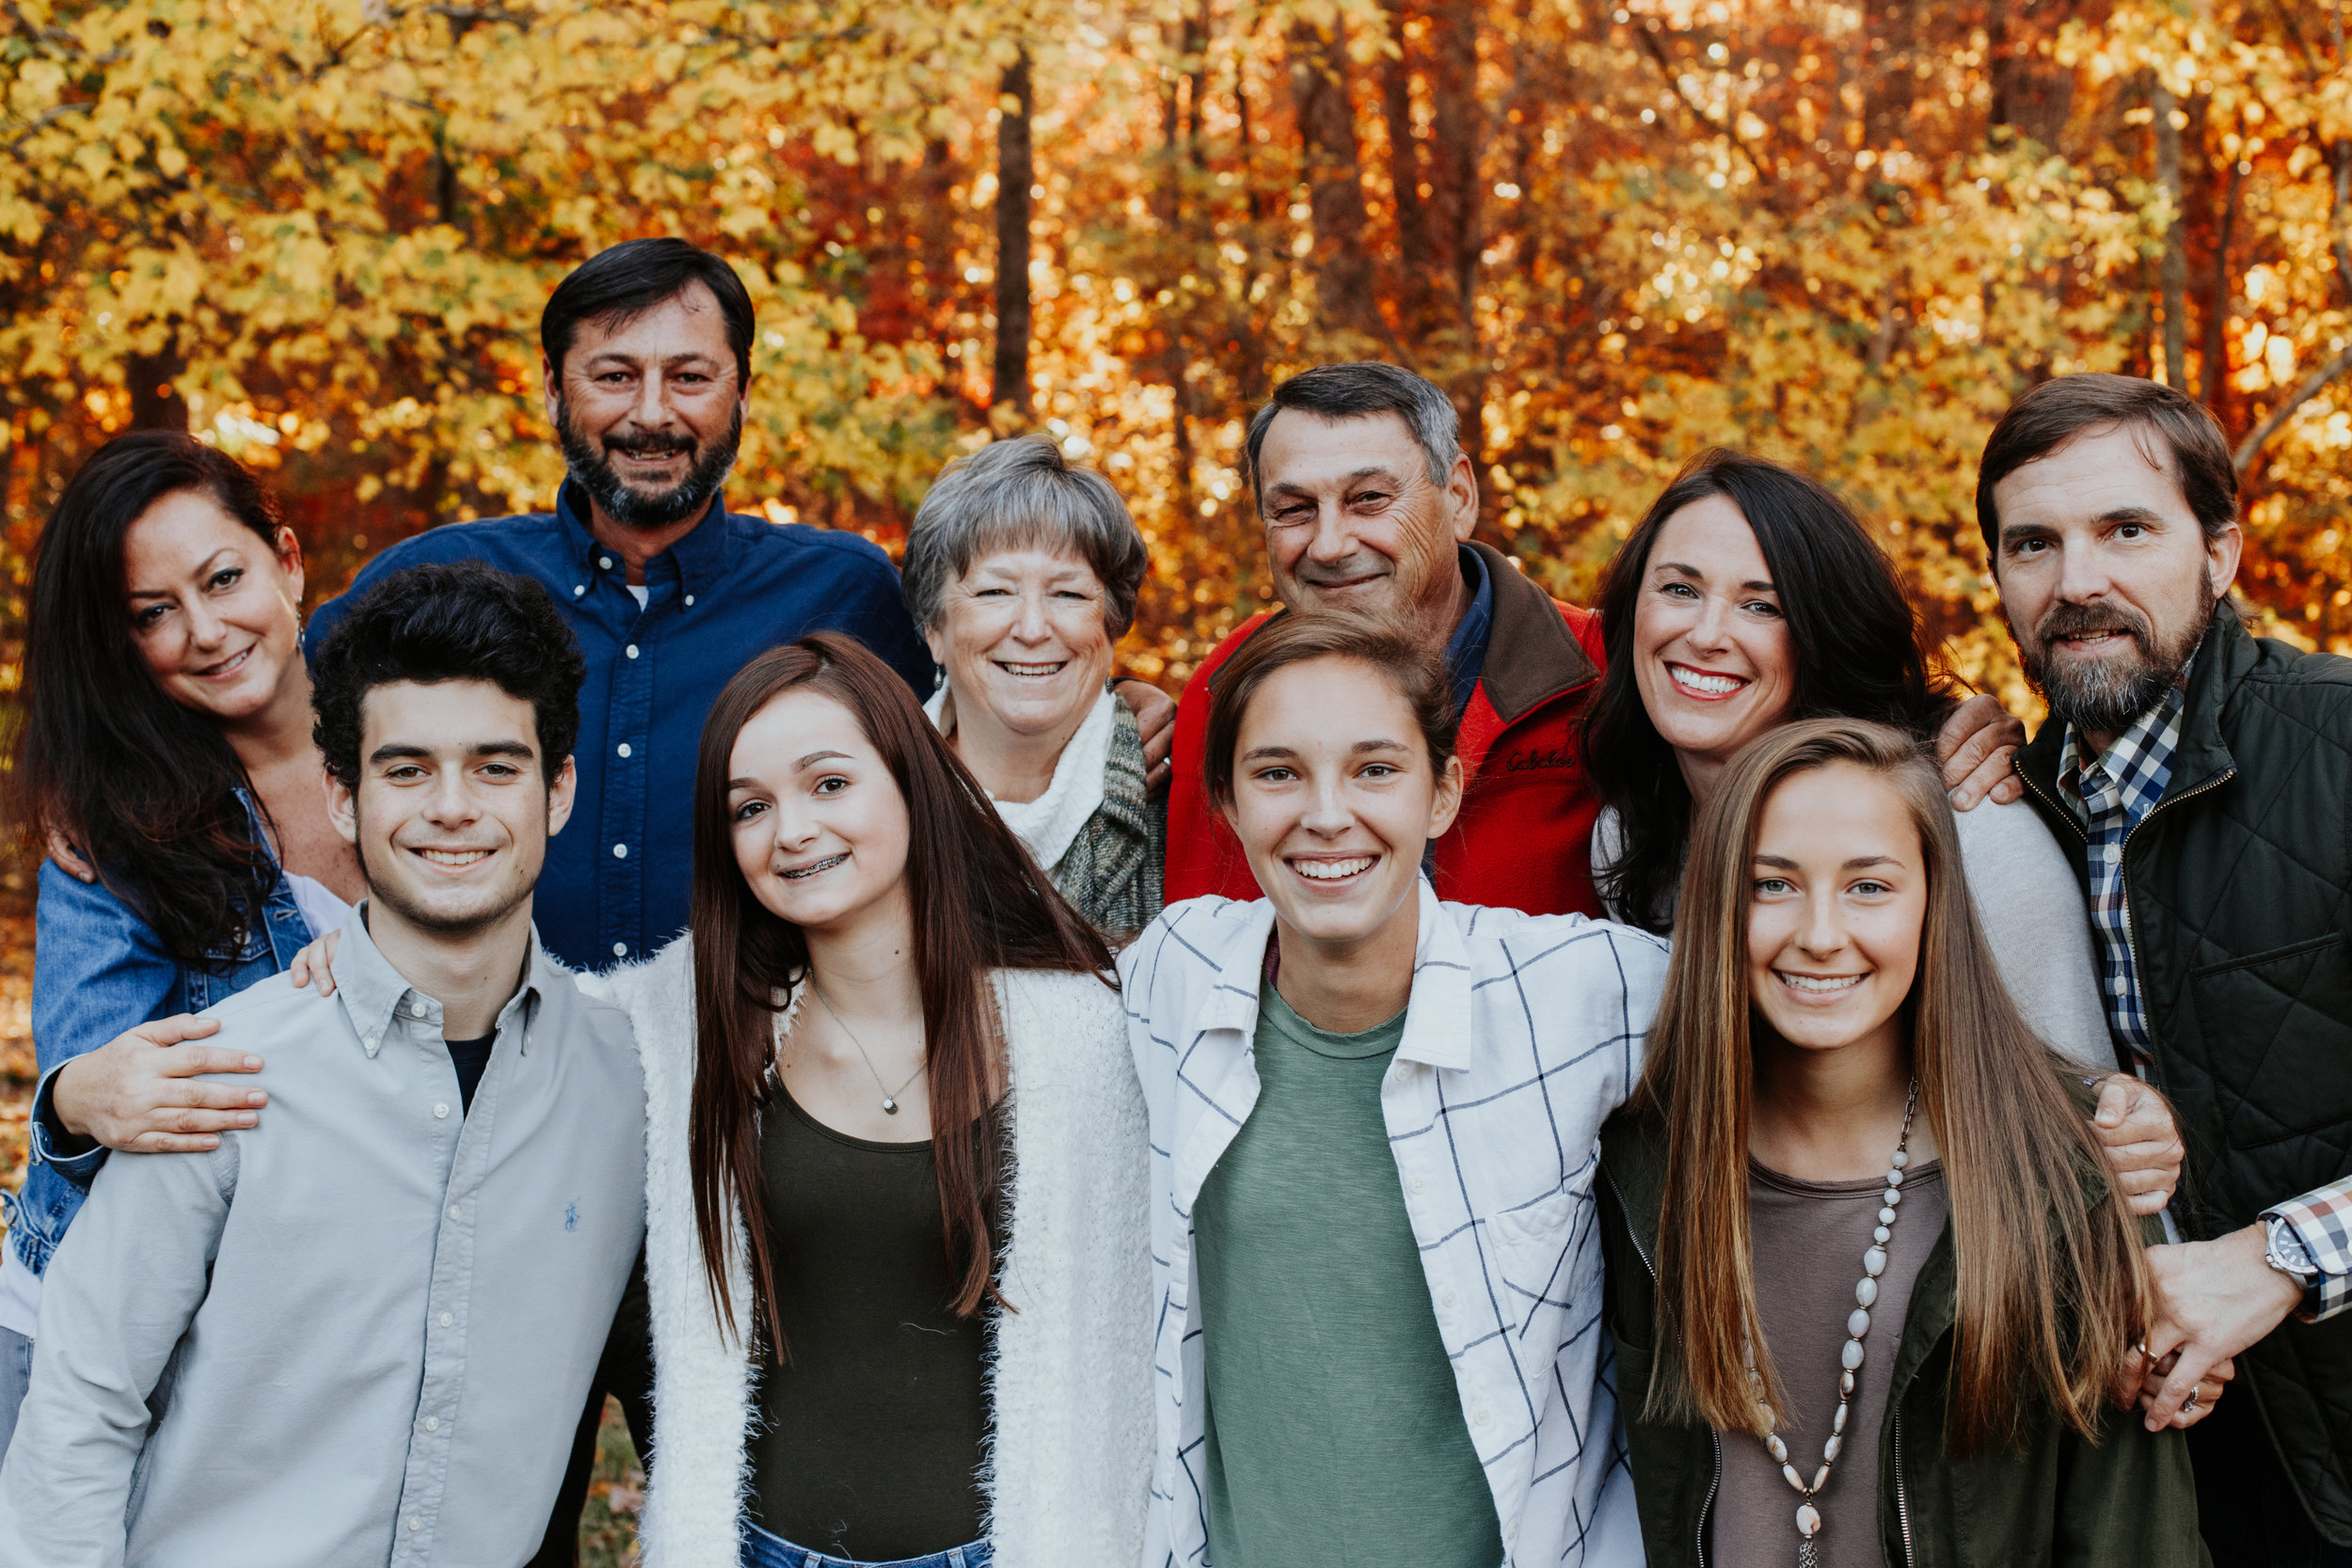 thedavisfamily-4.jpg